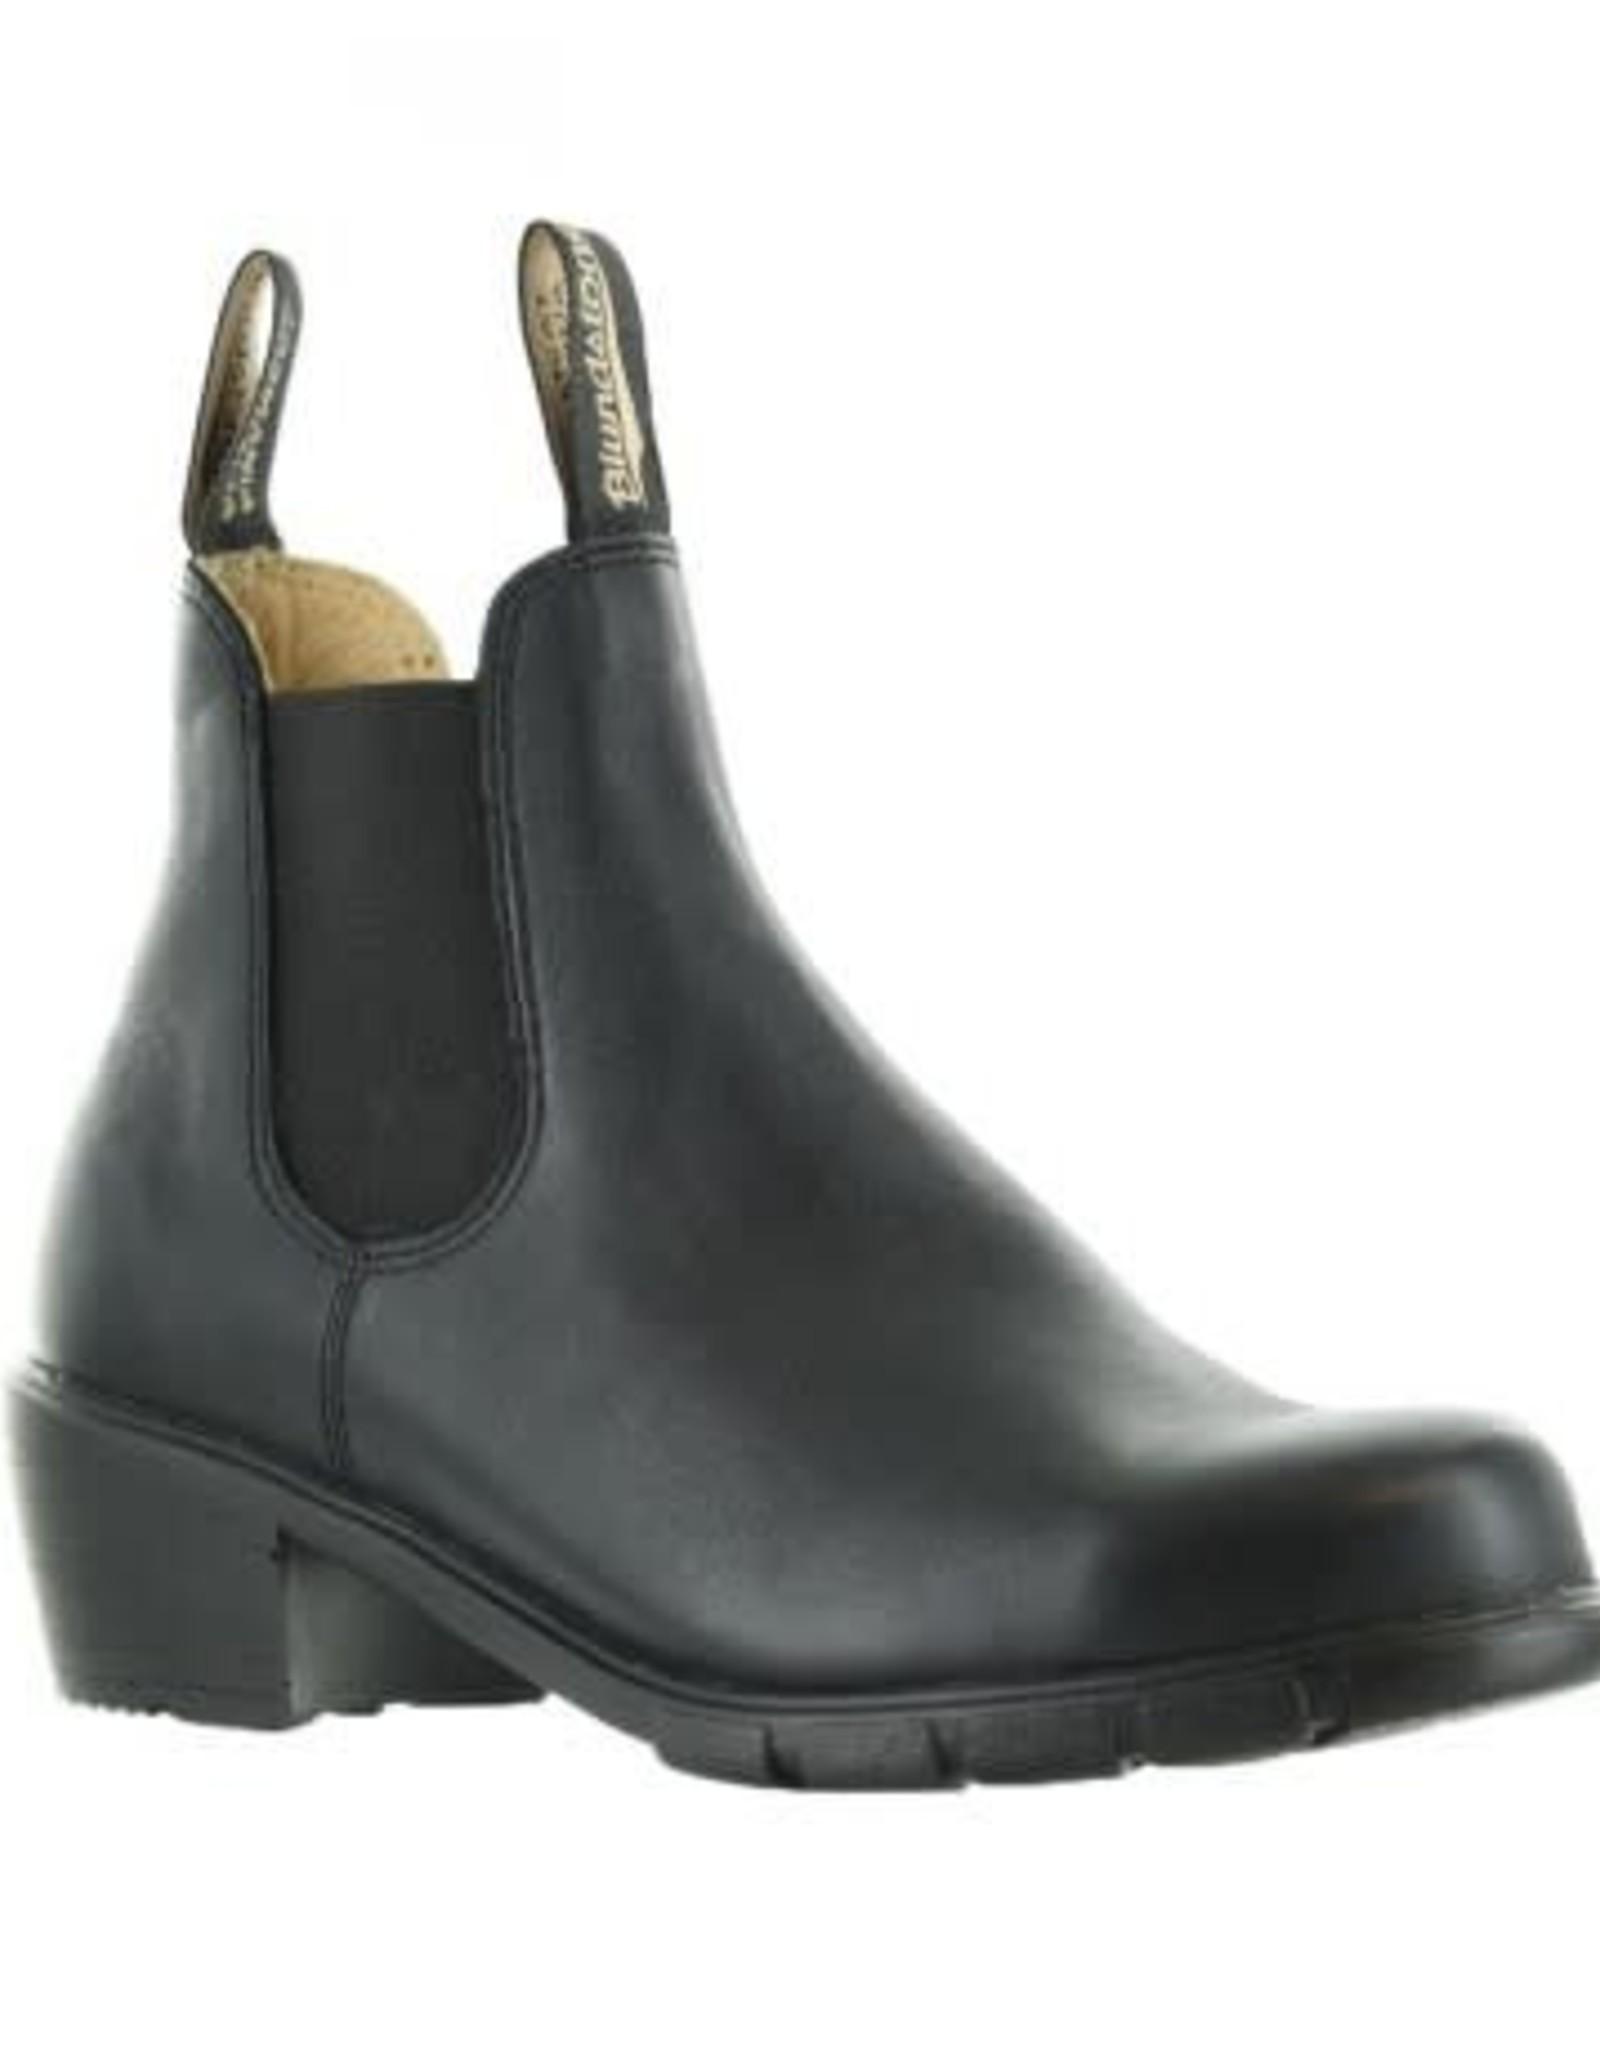 Blundstone Blundstone, Black , Heel 1671, 1WIDTH, 5.5